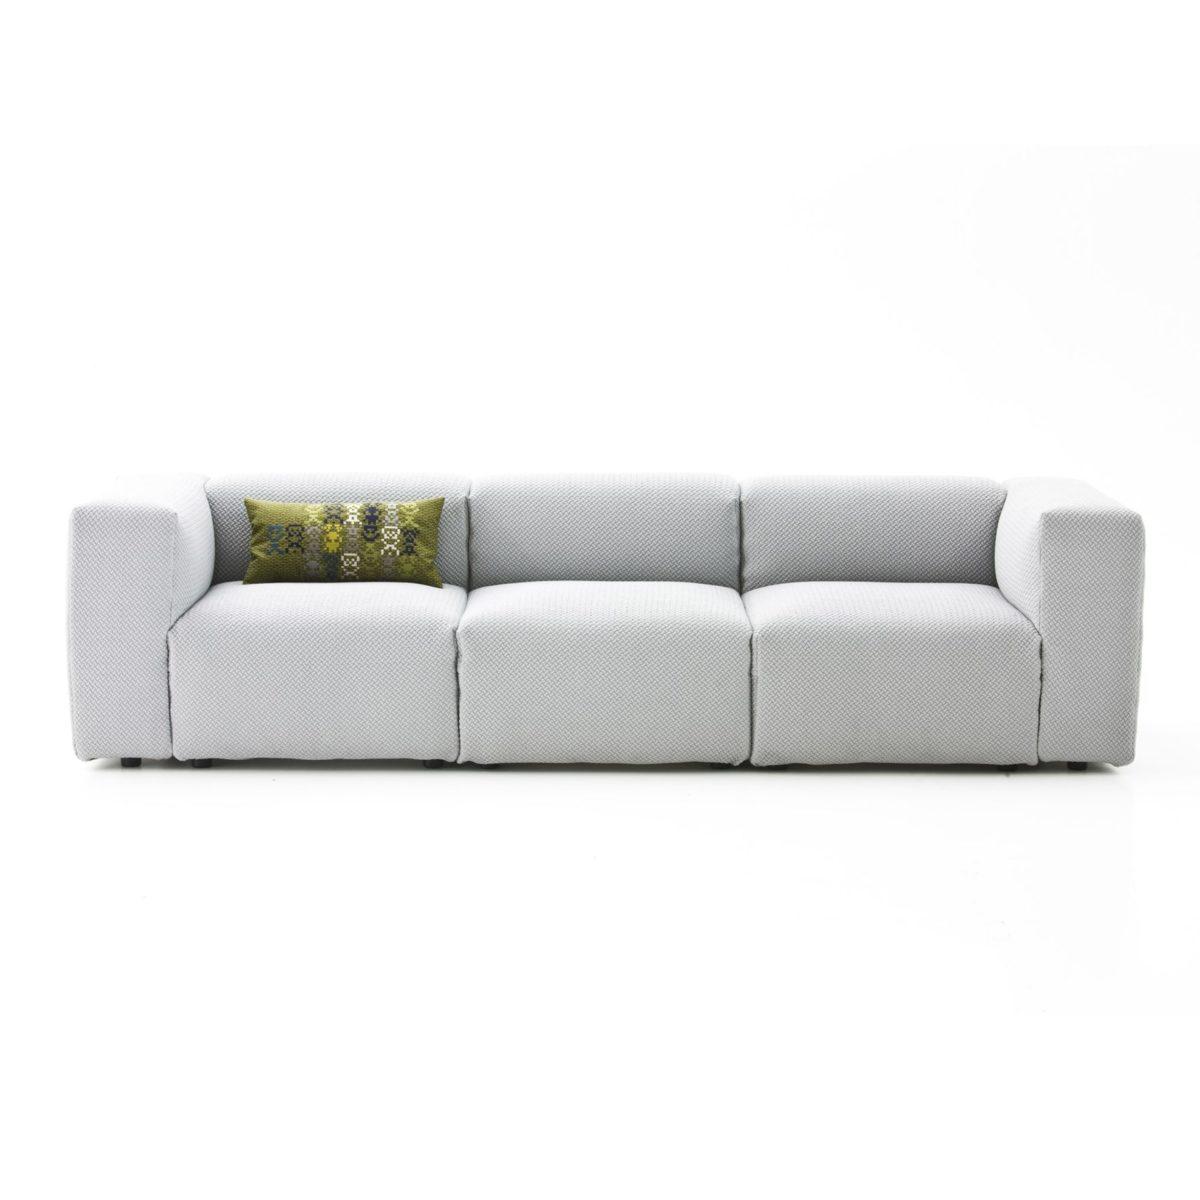 купить диван Spring moroso